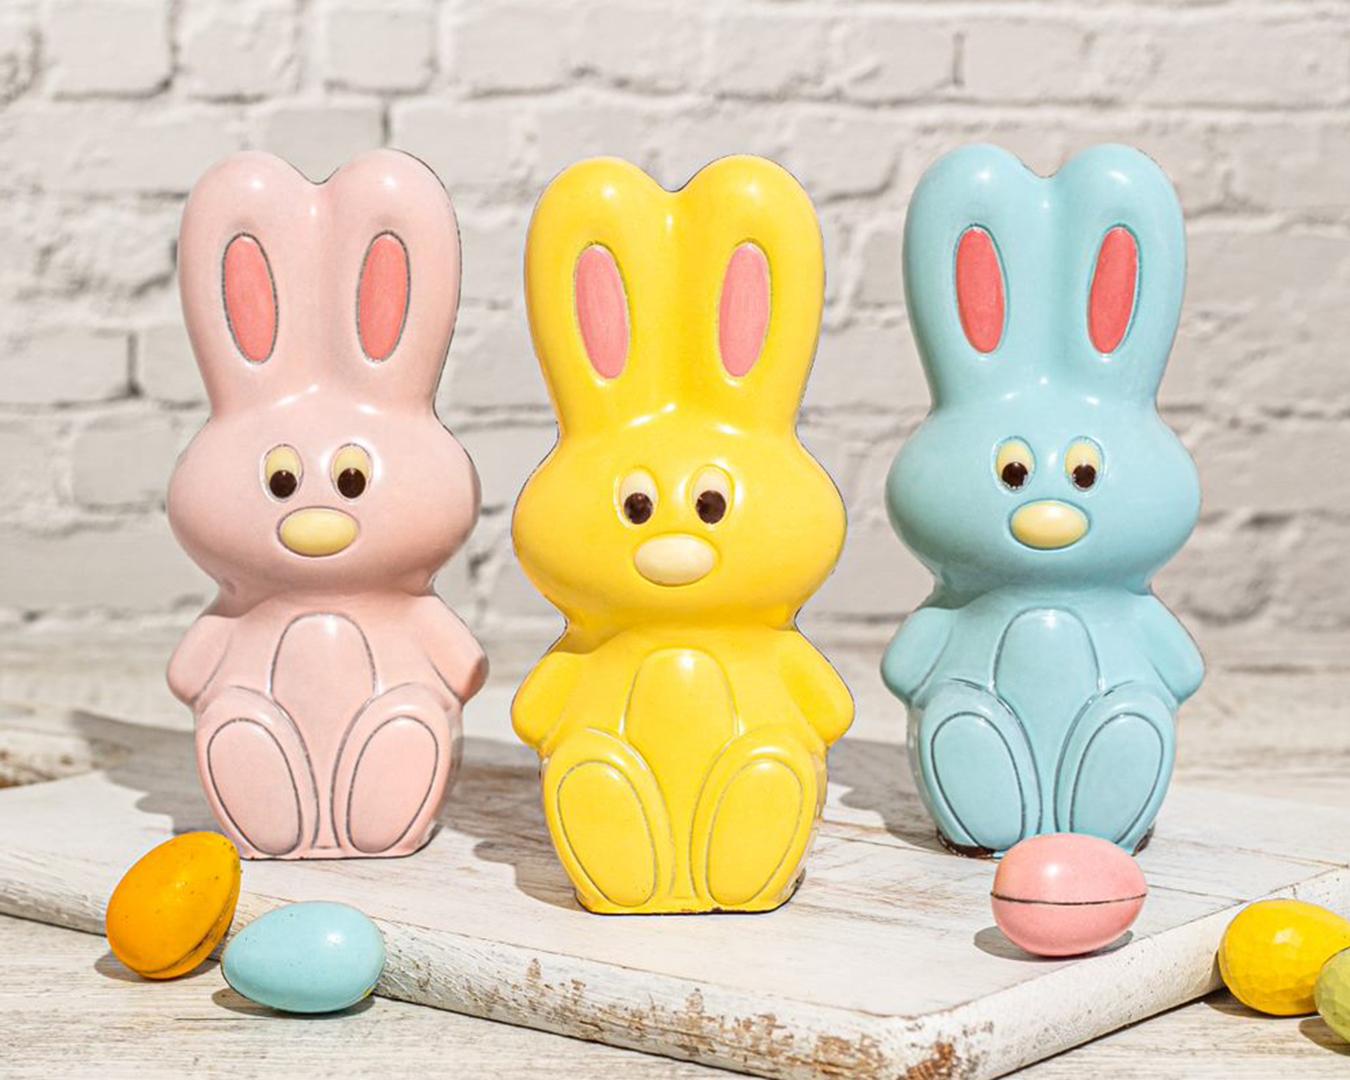 Colourful bunnies from farro fresh.